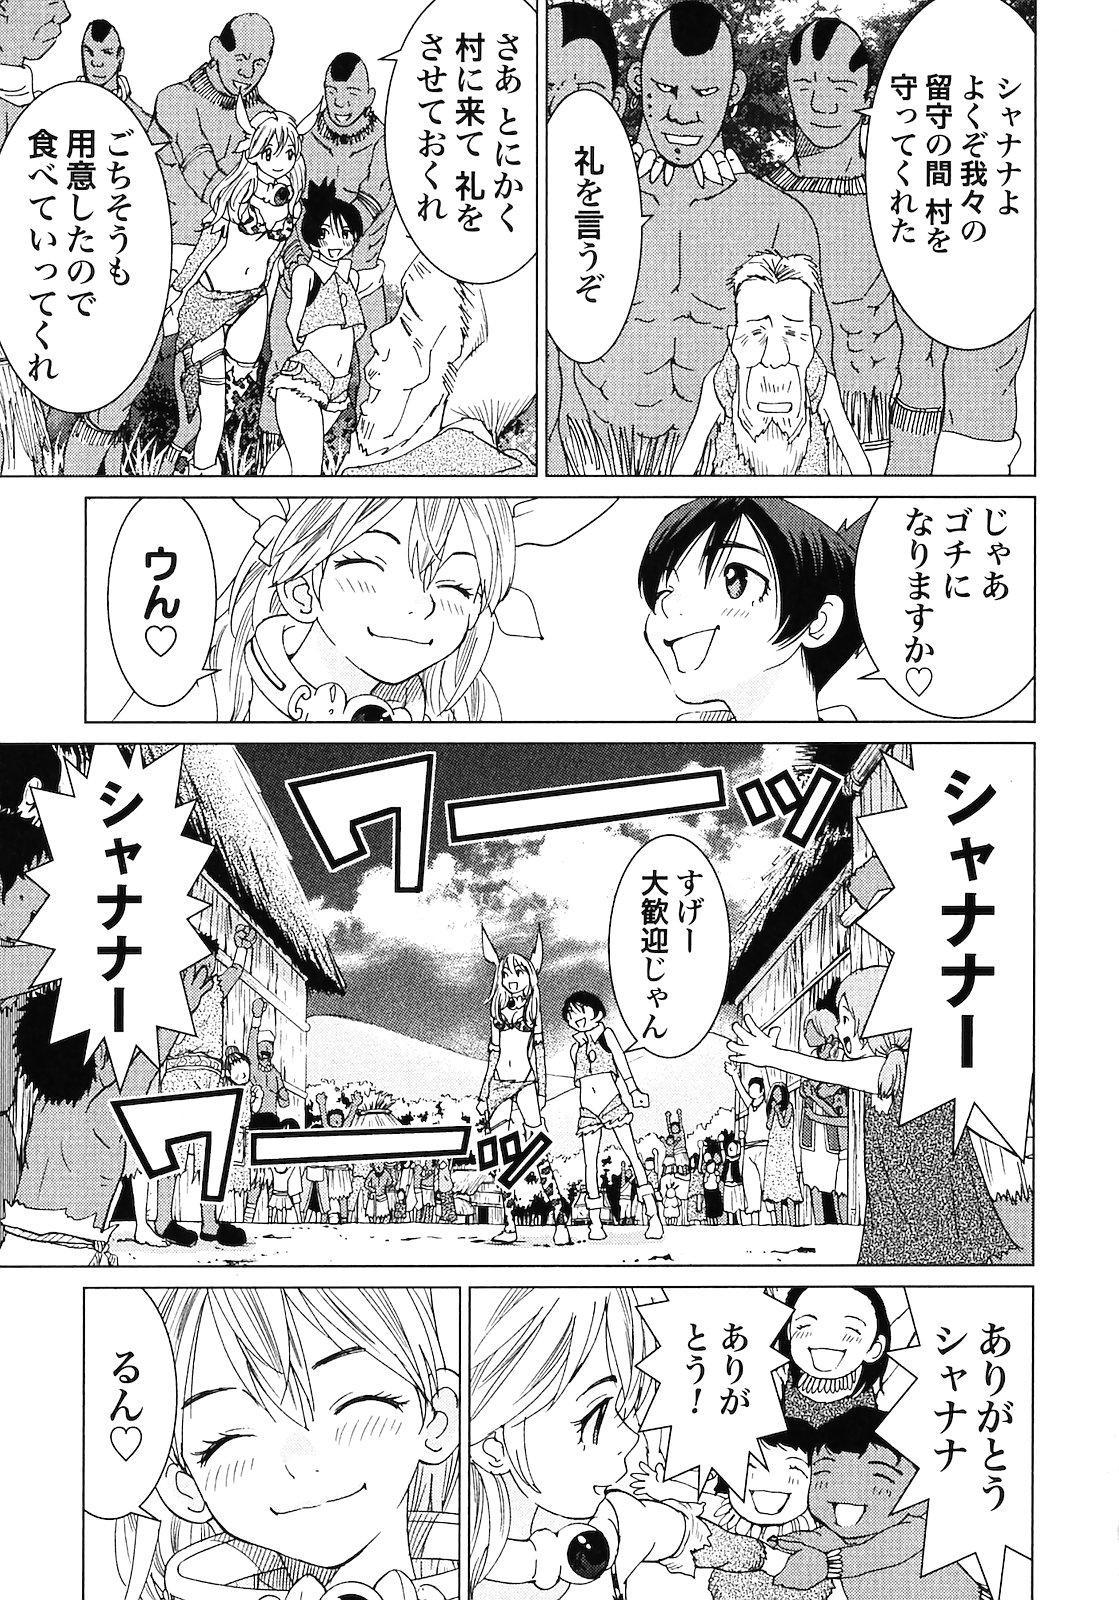 Makyo no Shanana Vol.02 186